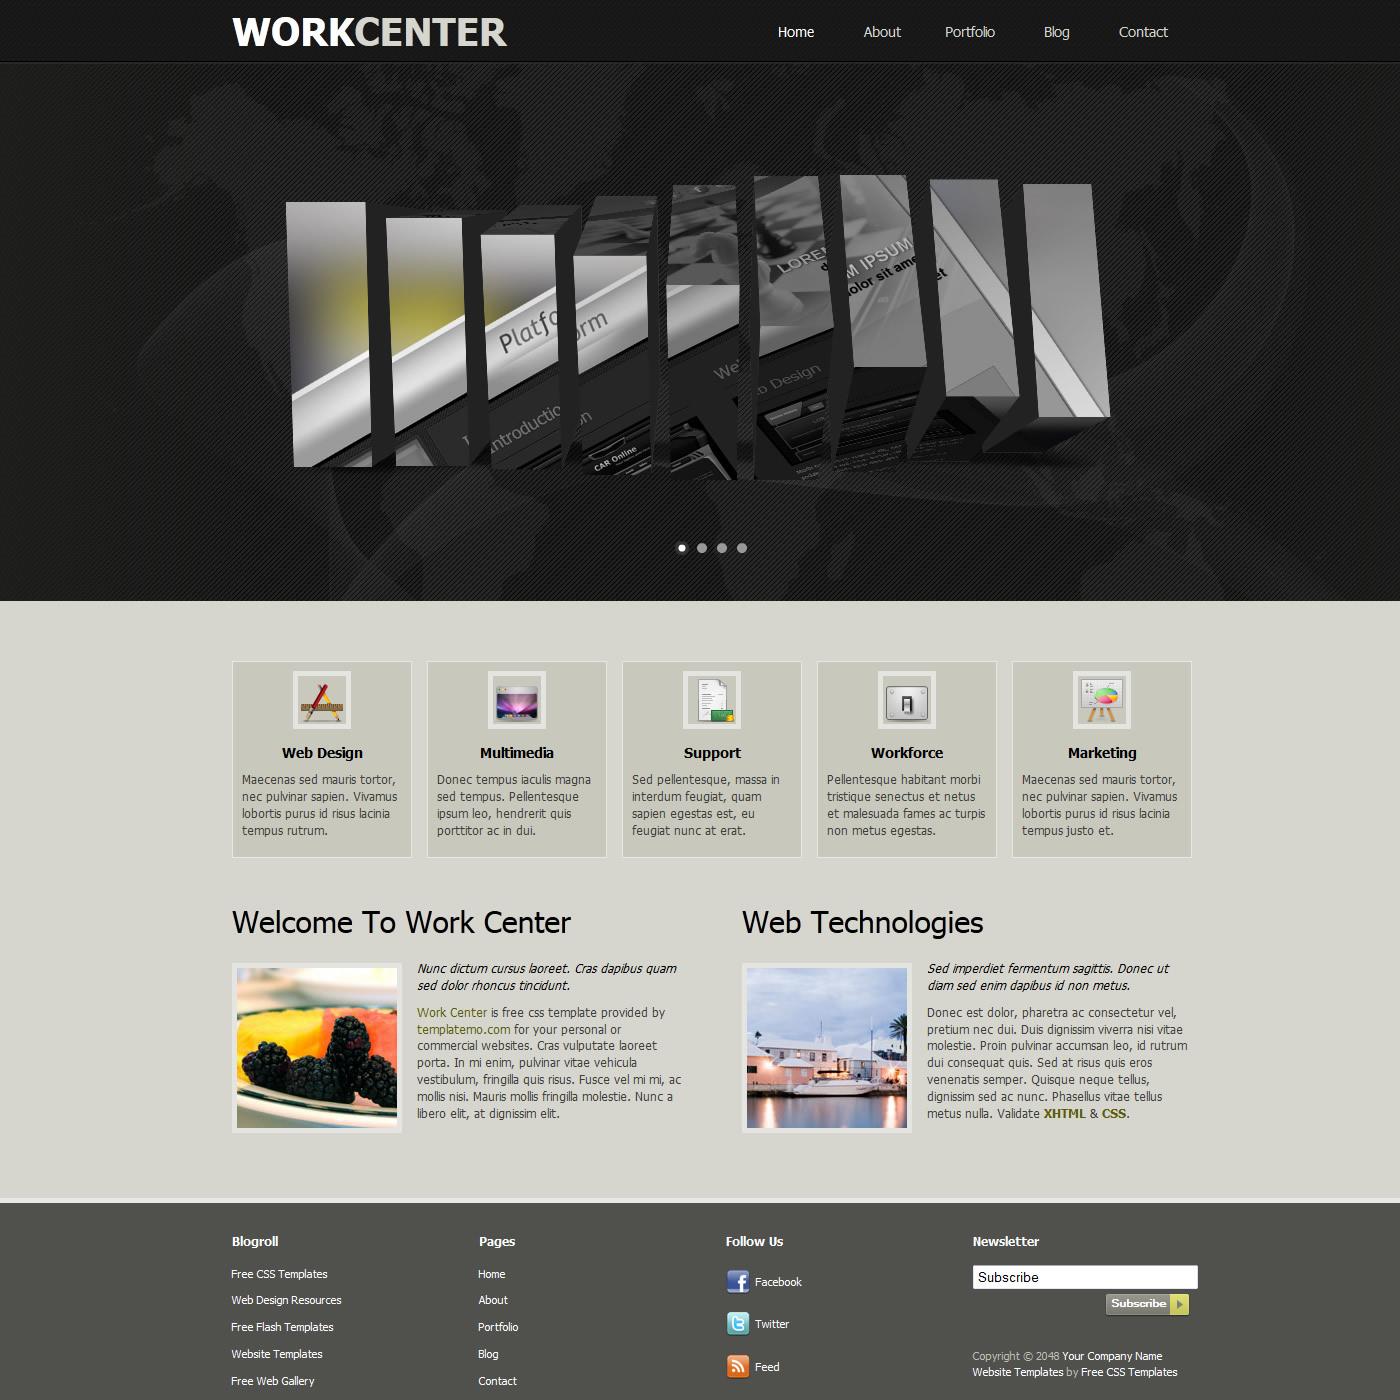 Dreamweaver Templates | Free Template 355 Work Center